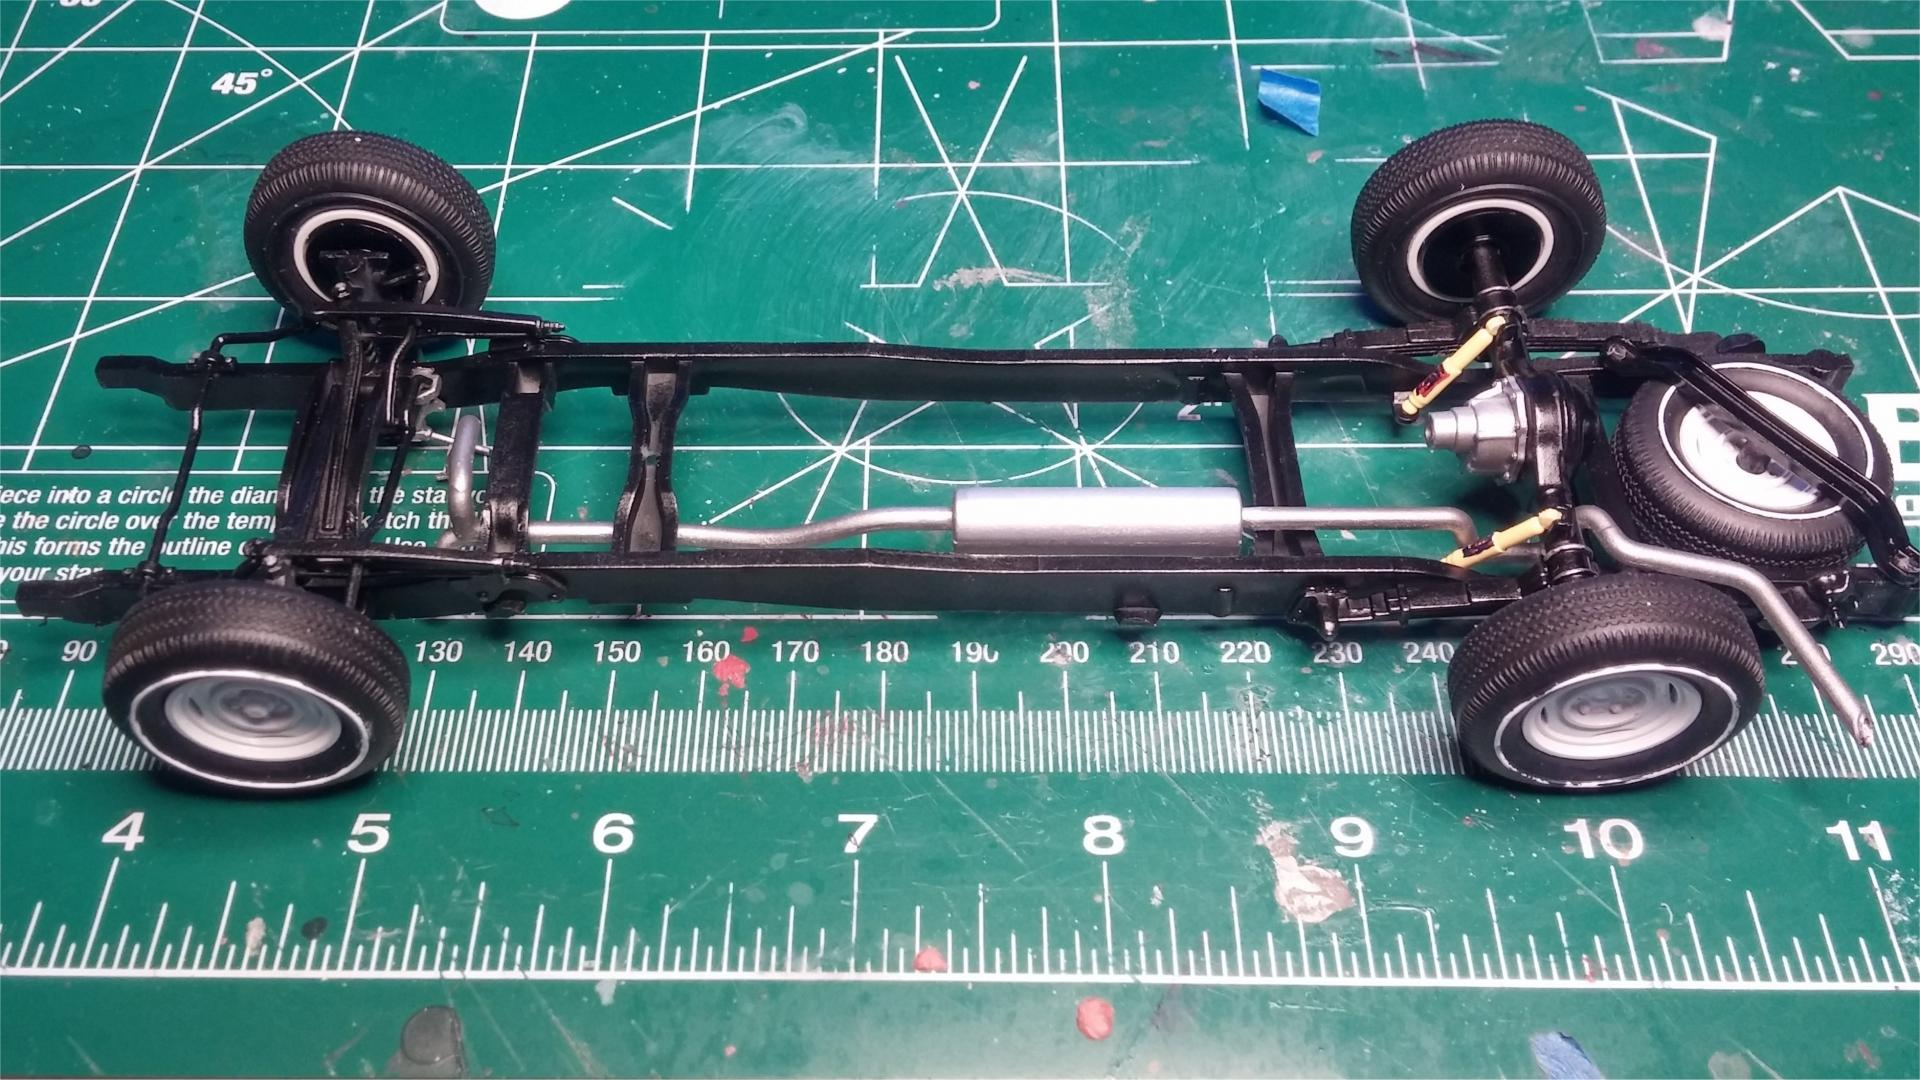 71_Ranger02.thumb.jpg.404d55901bdbd25bc8